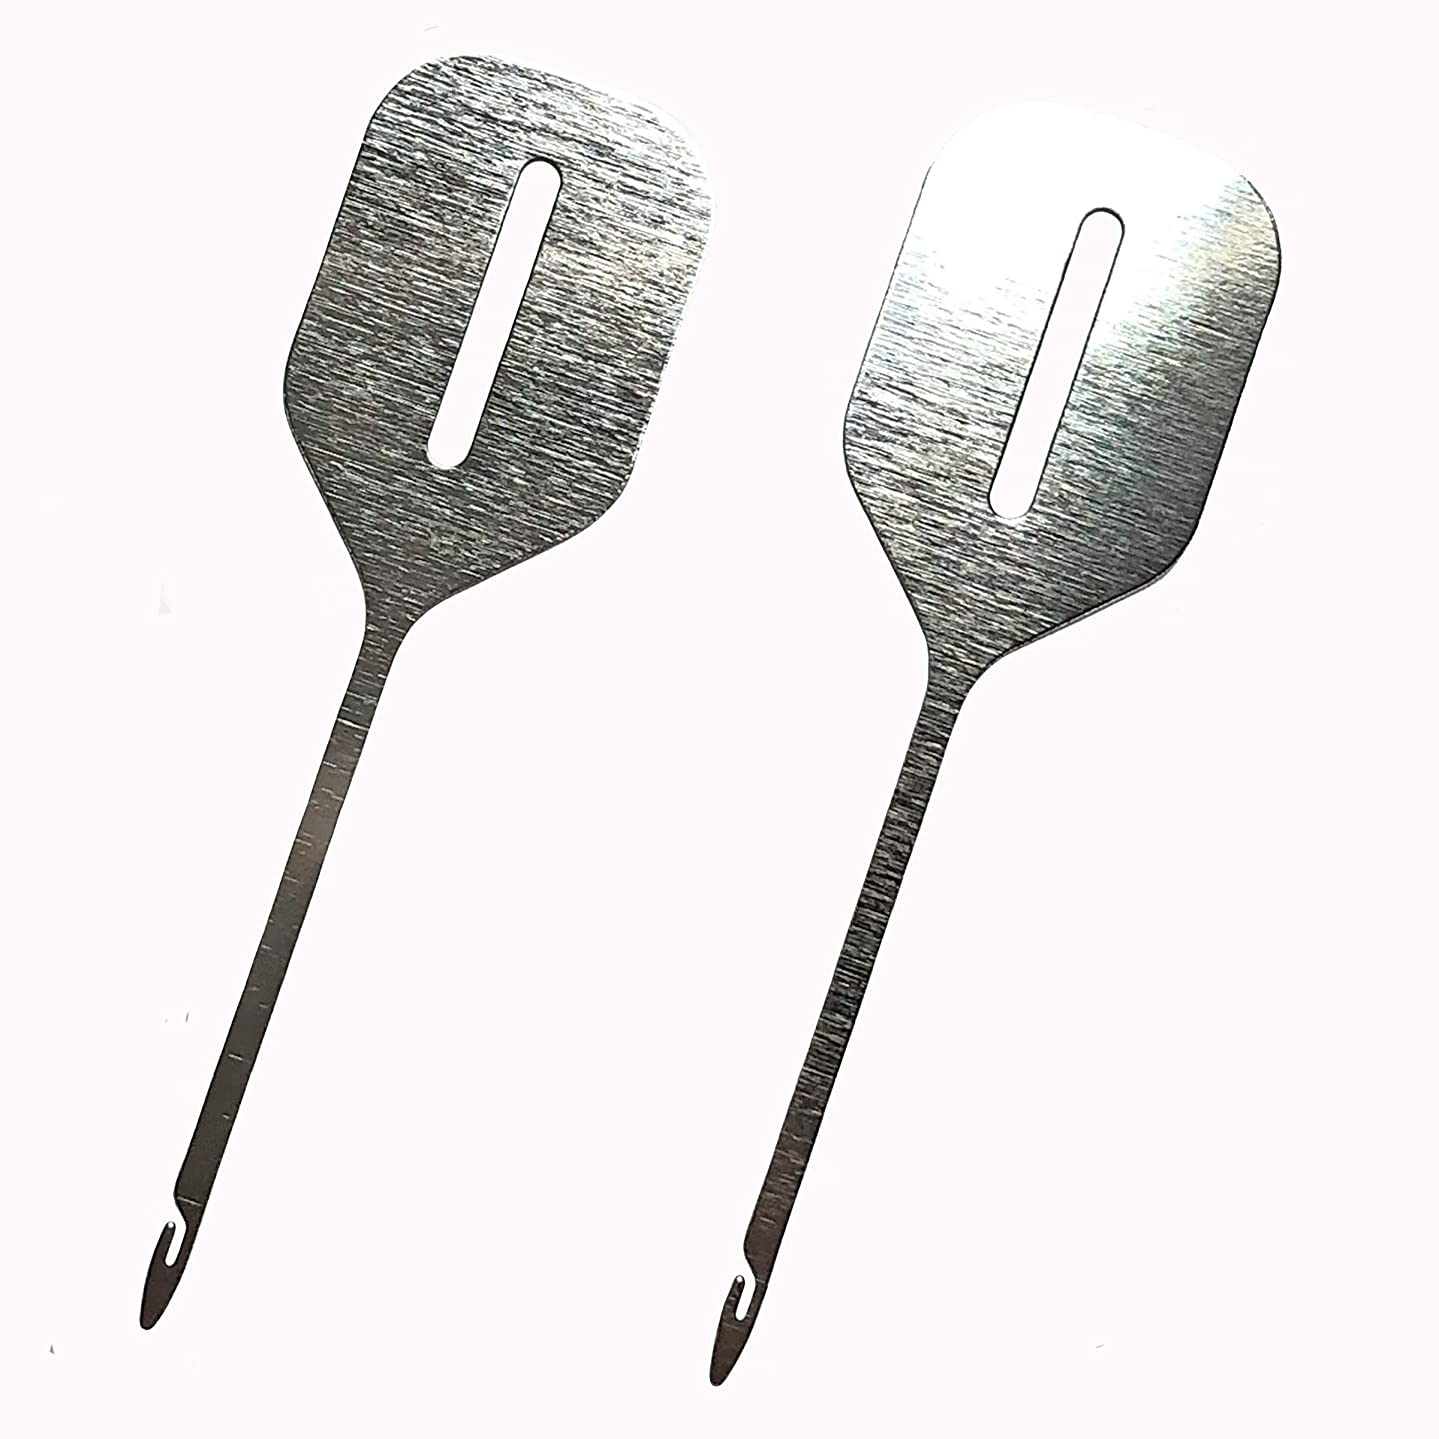 Hookey serger Seam Hooks (2) Lock Seam Tails